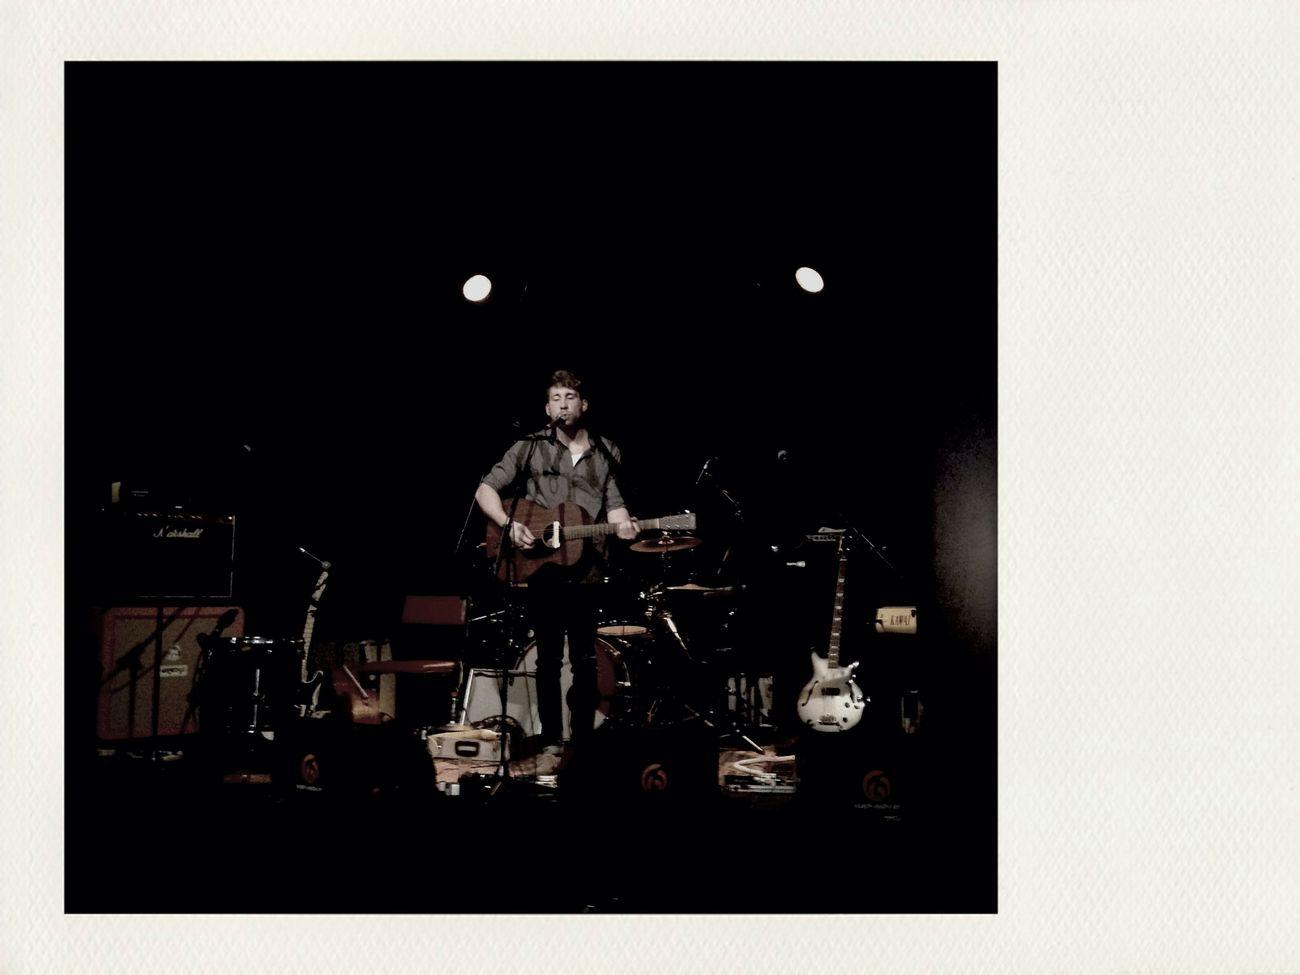 Kurz vor Gregor McEwan Bands@weltecho Awesome Music